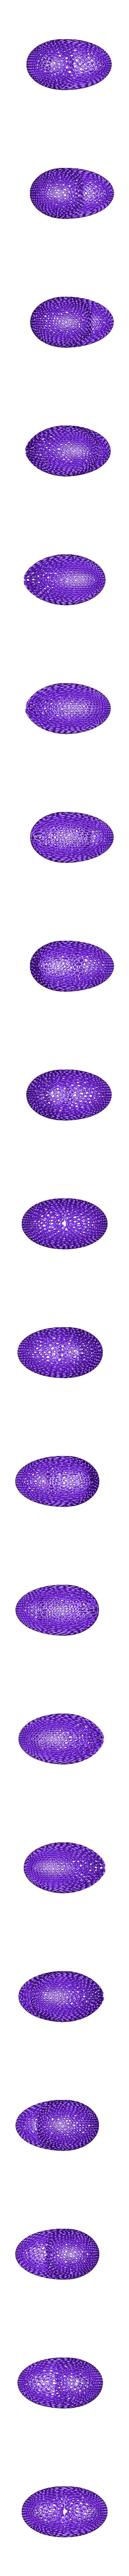 Heart_-_Voronoi_C.stl Download free STL file Heart - Voronoi Style • 3D printable object, Numbmond